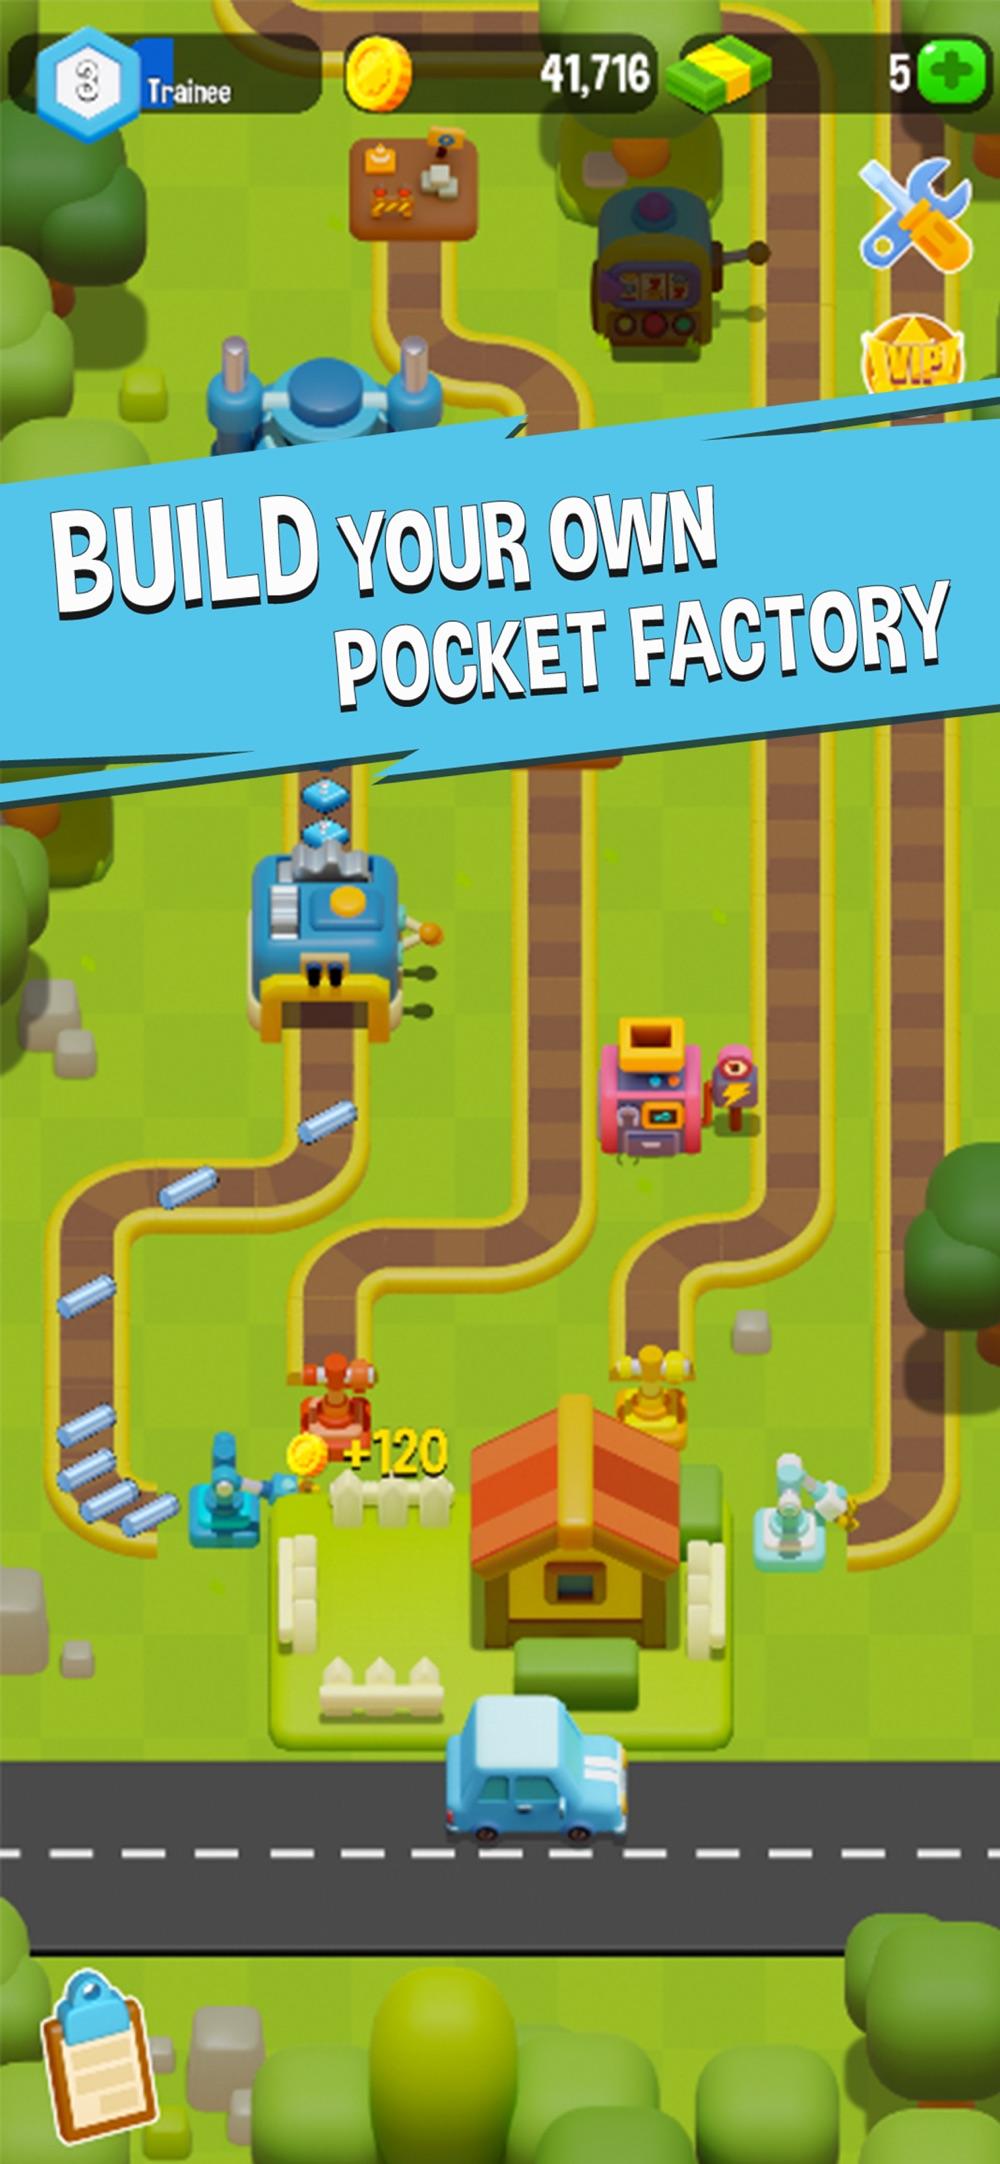 Pocket Factory Cheat Codes